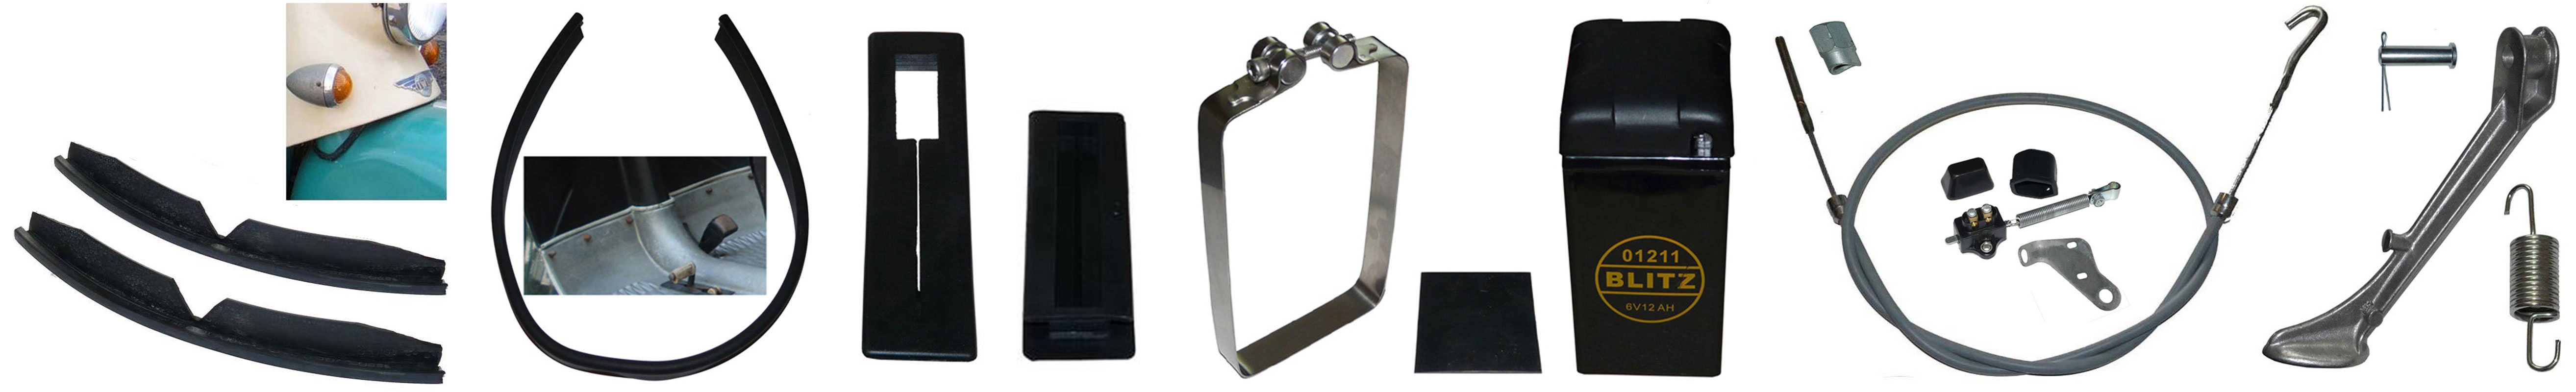 trittbrett schutzblech iwl berlin sr 59 ddr. Black Bedroom Furniture Sets. Home Design Ideas